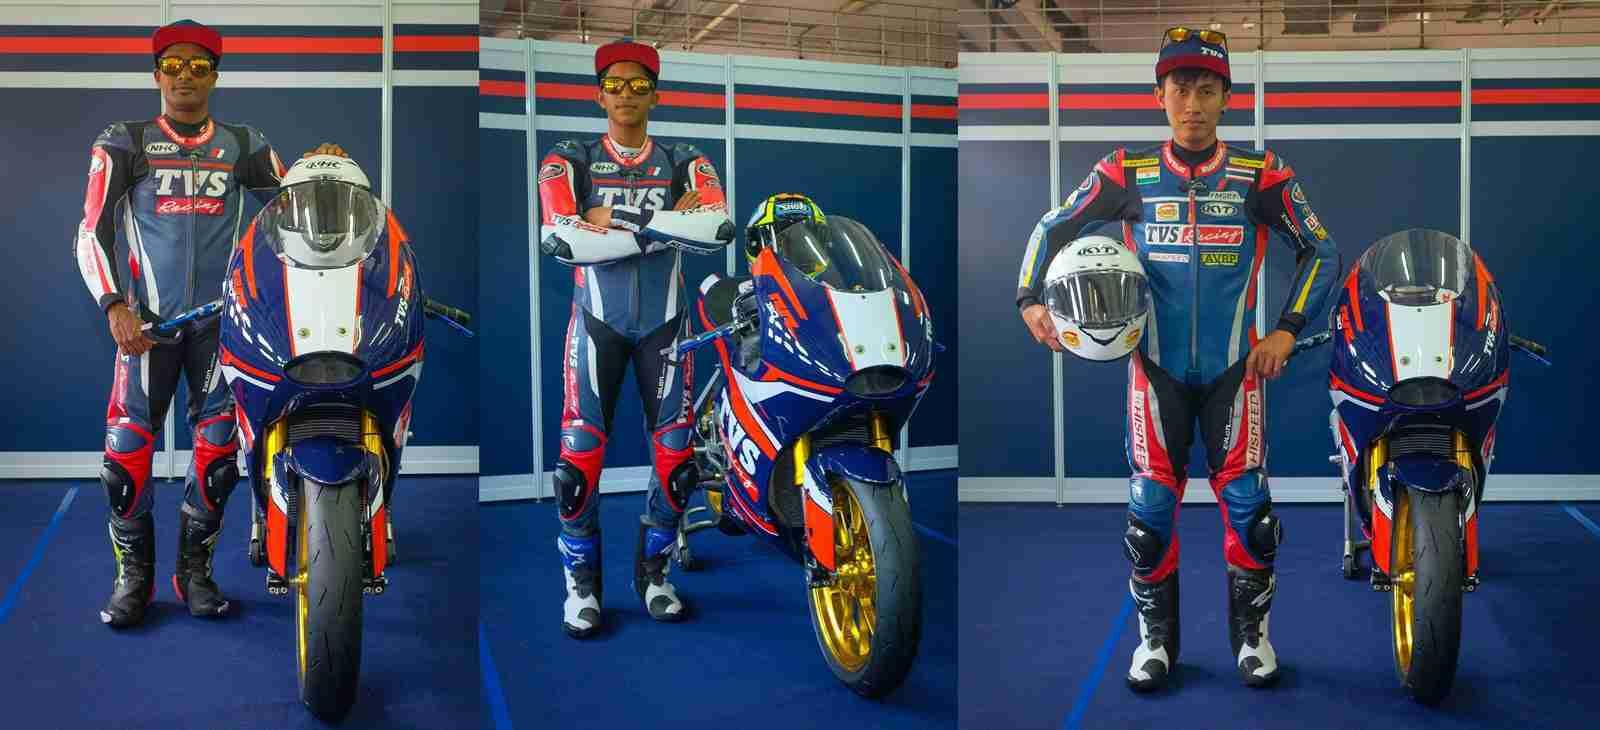 TVS Racing Asia Road Racing Championship 2020 riders team